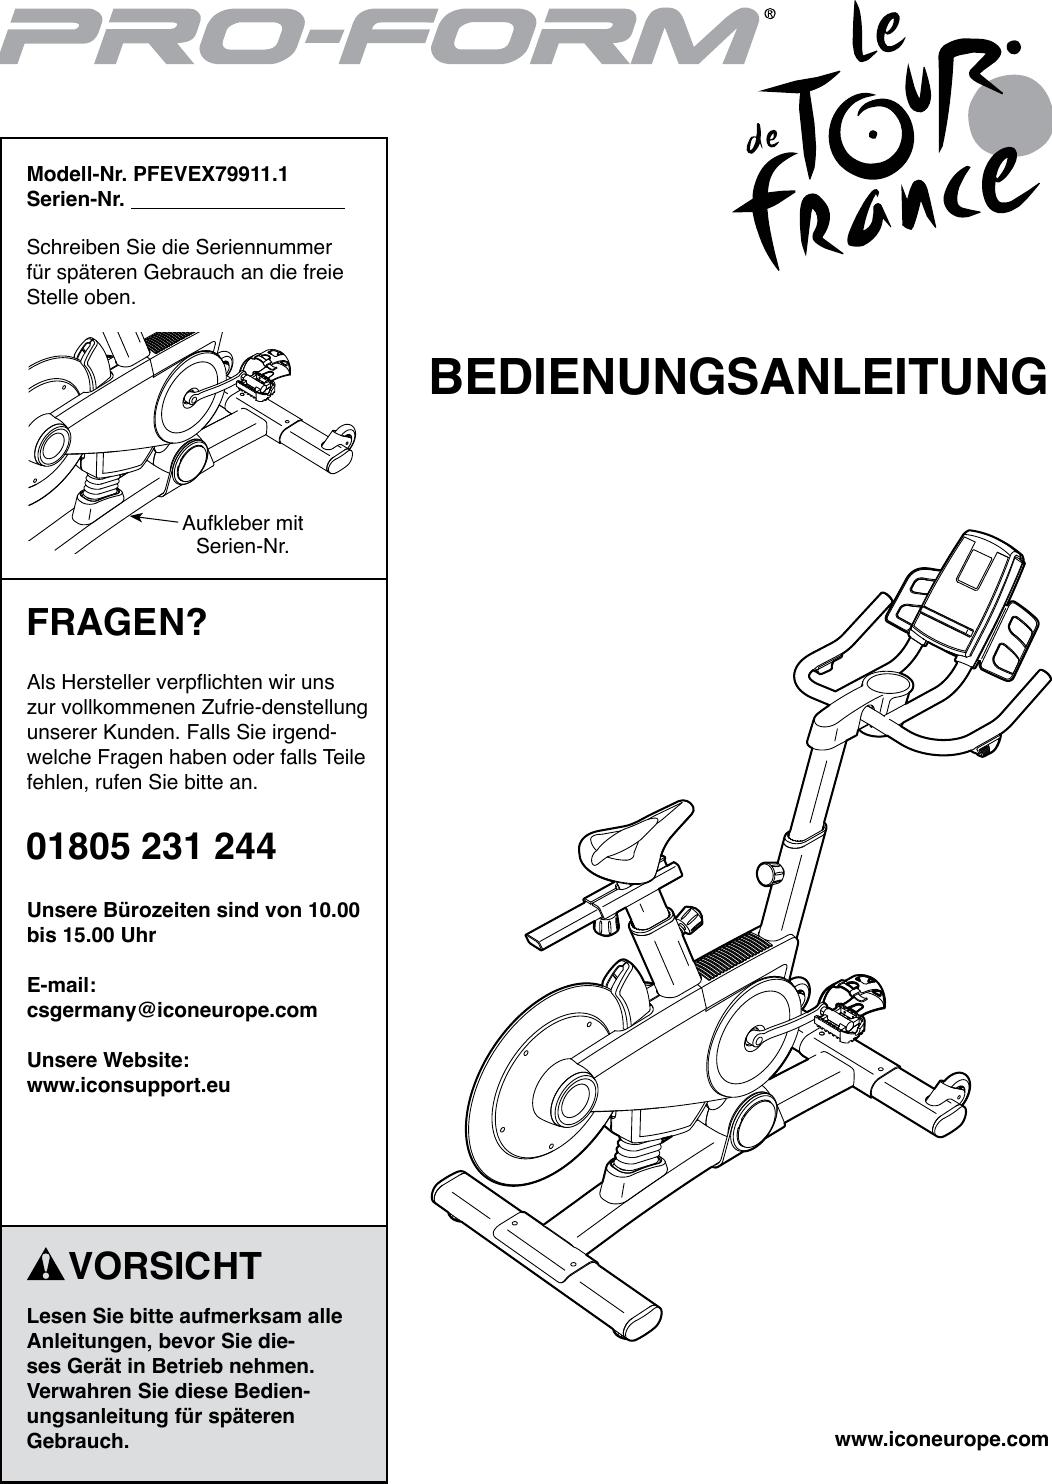 Großartig Drahtspulenheizelemente Bilder - Der Schaltplan - greigo.com